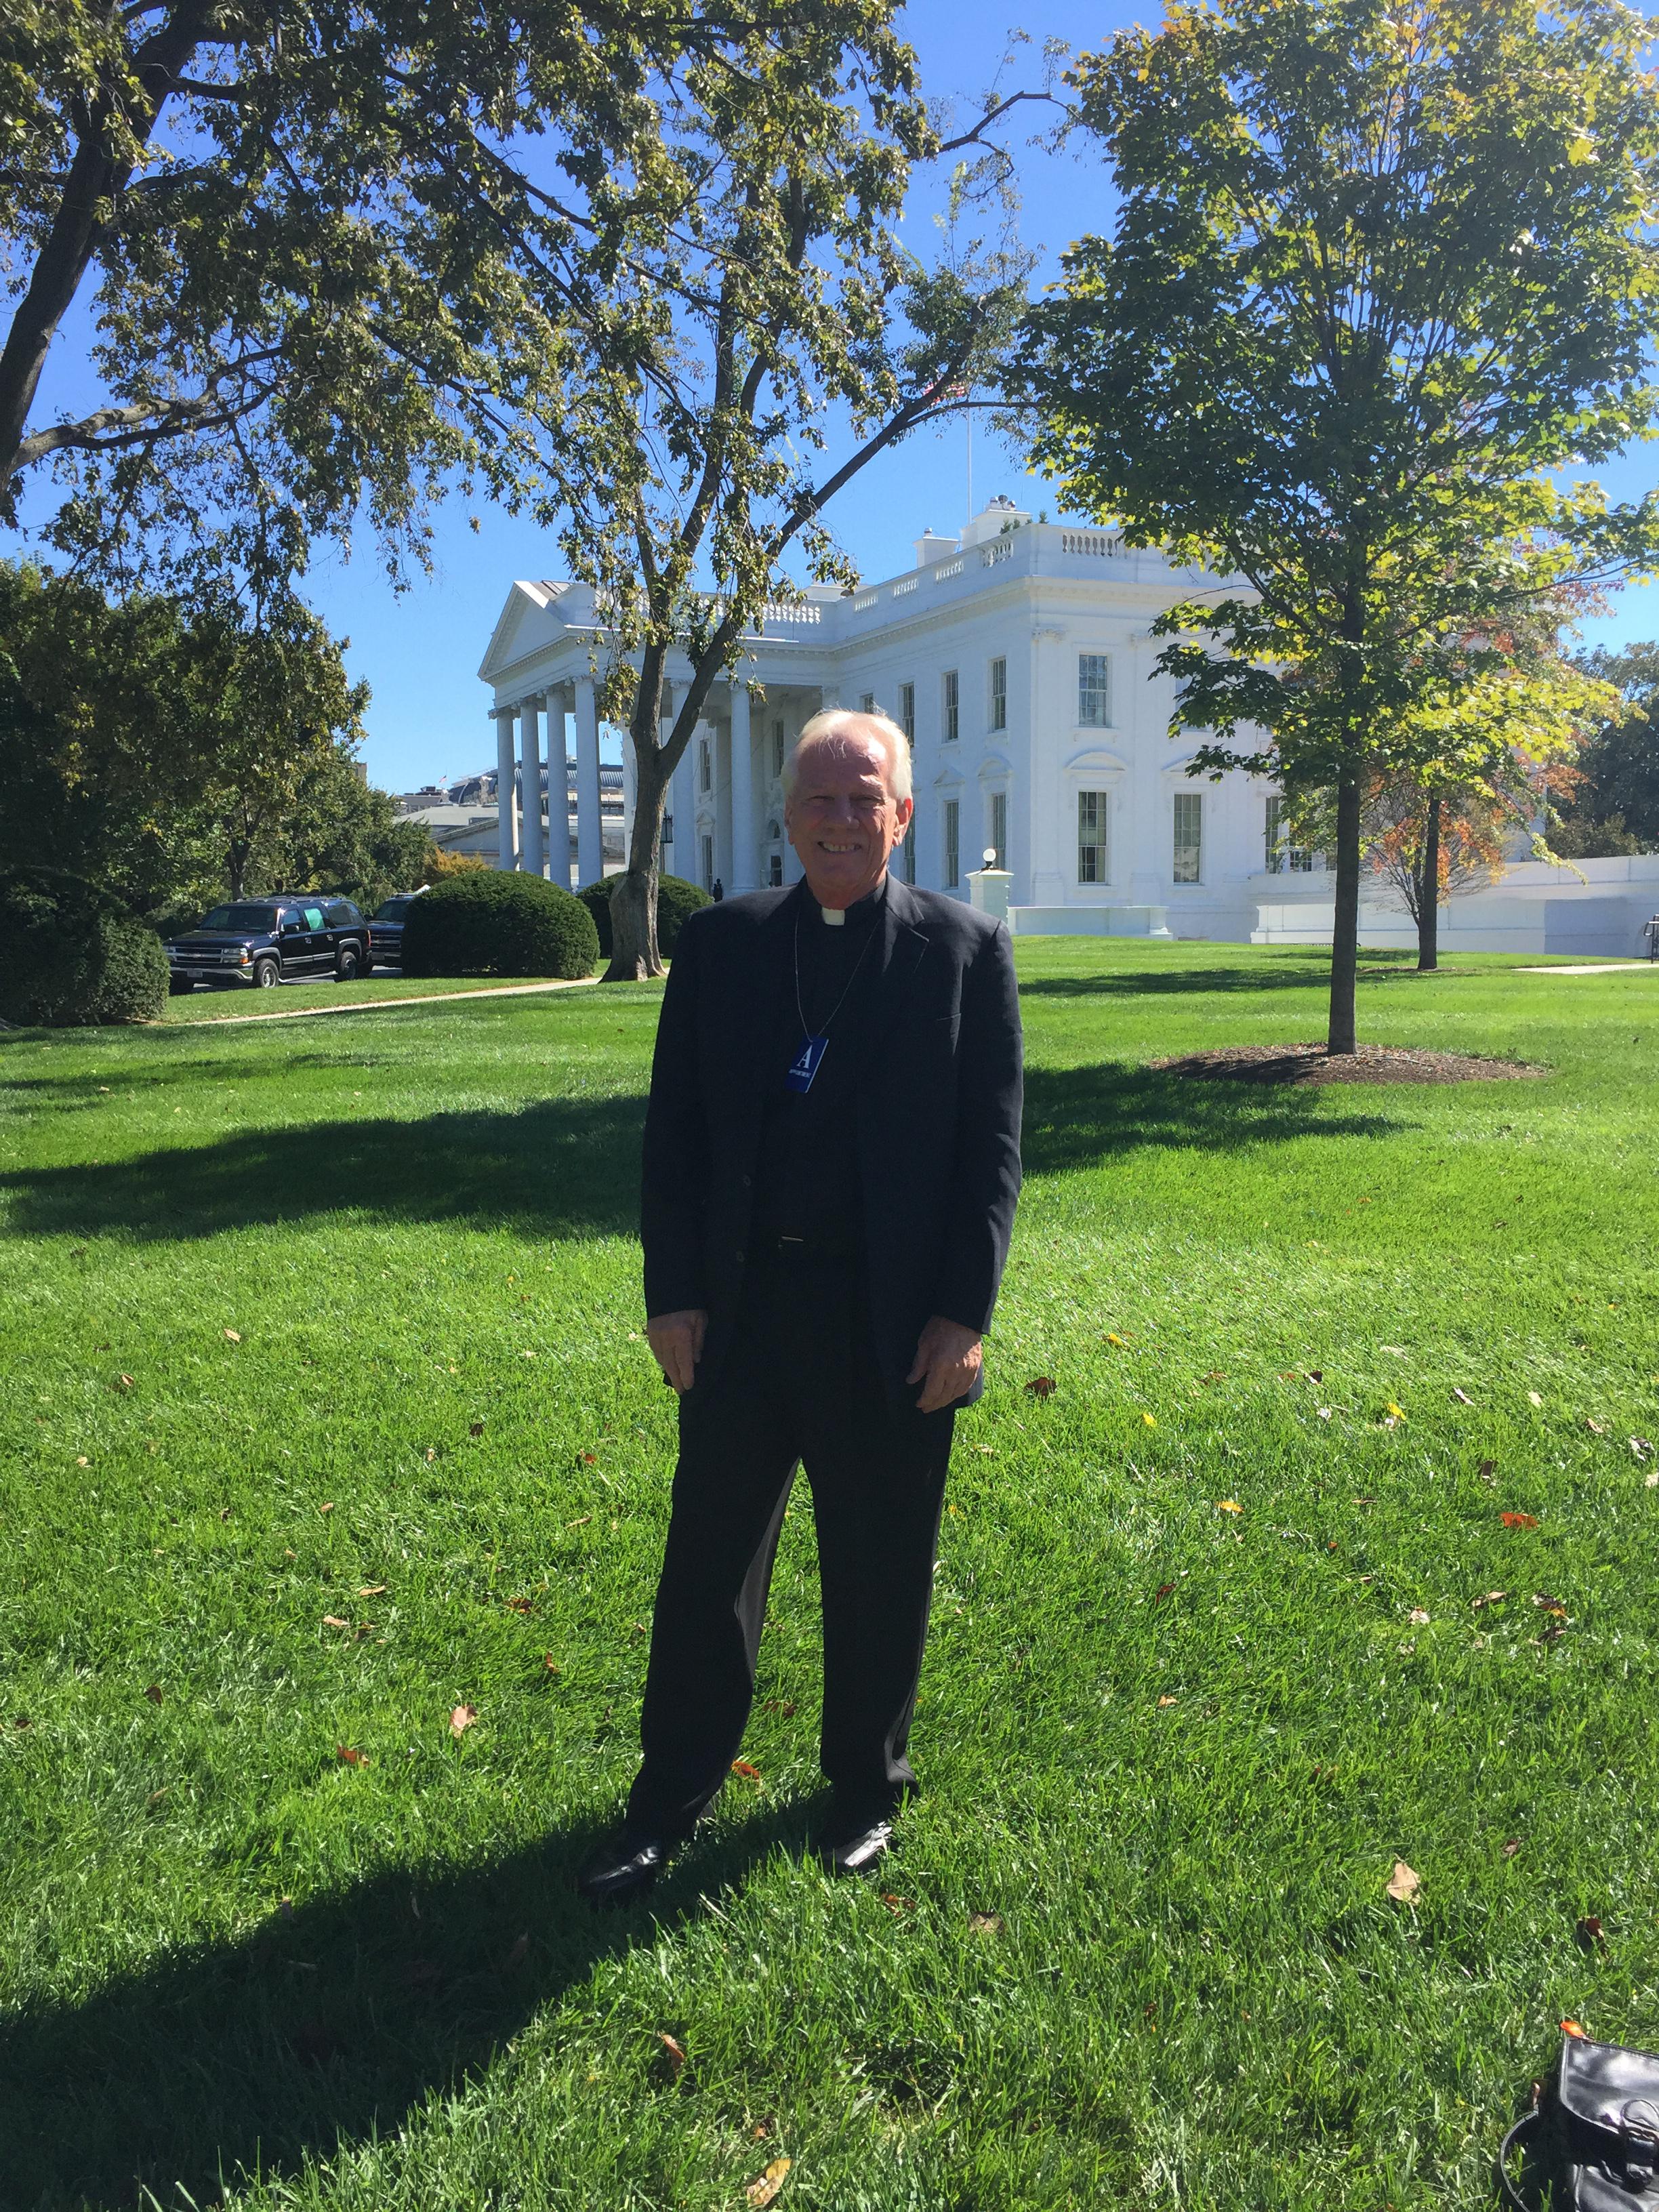 Fr Bob at White House